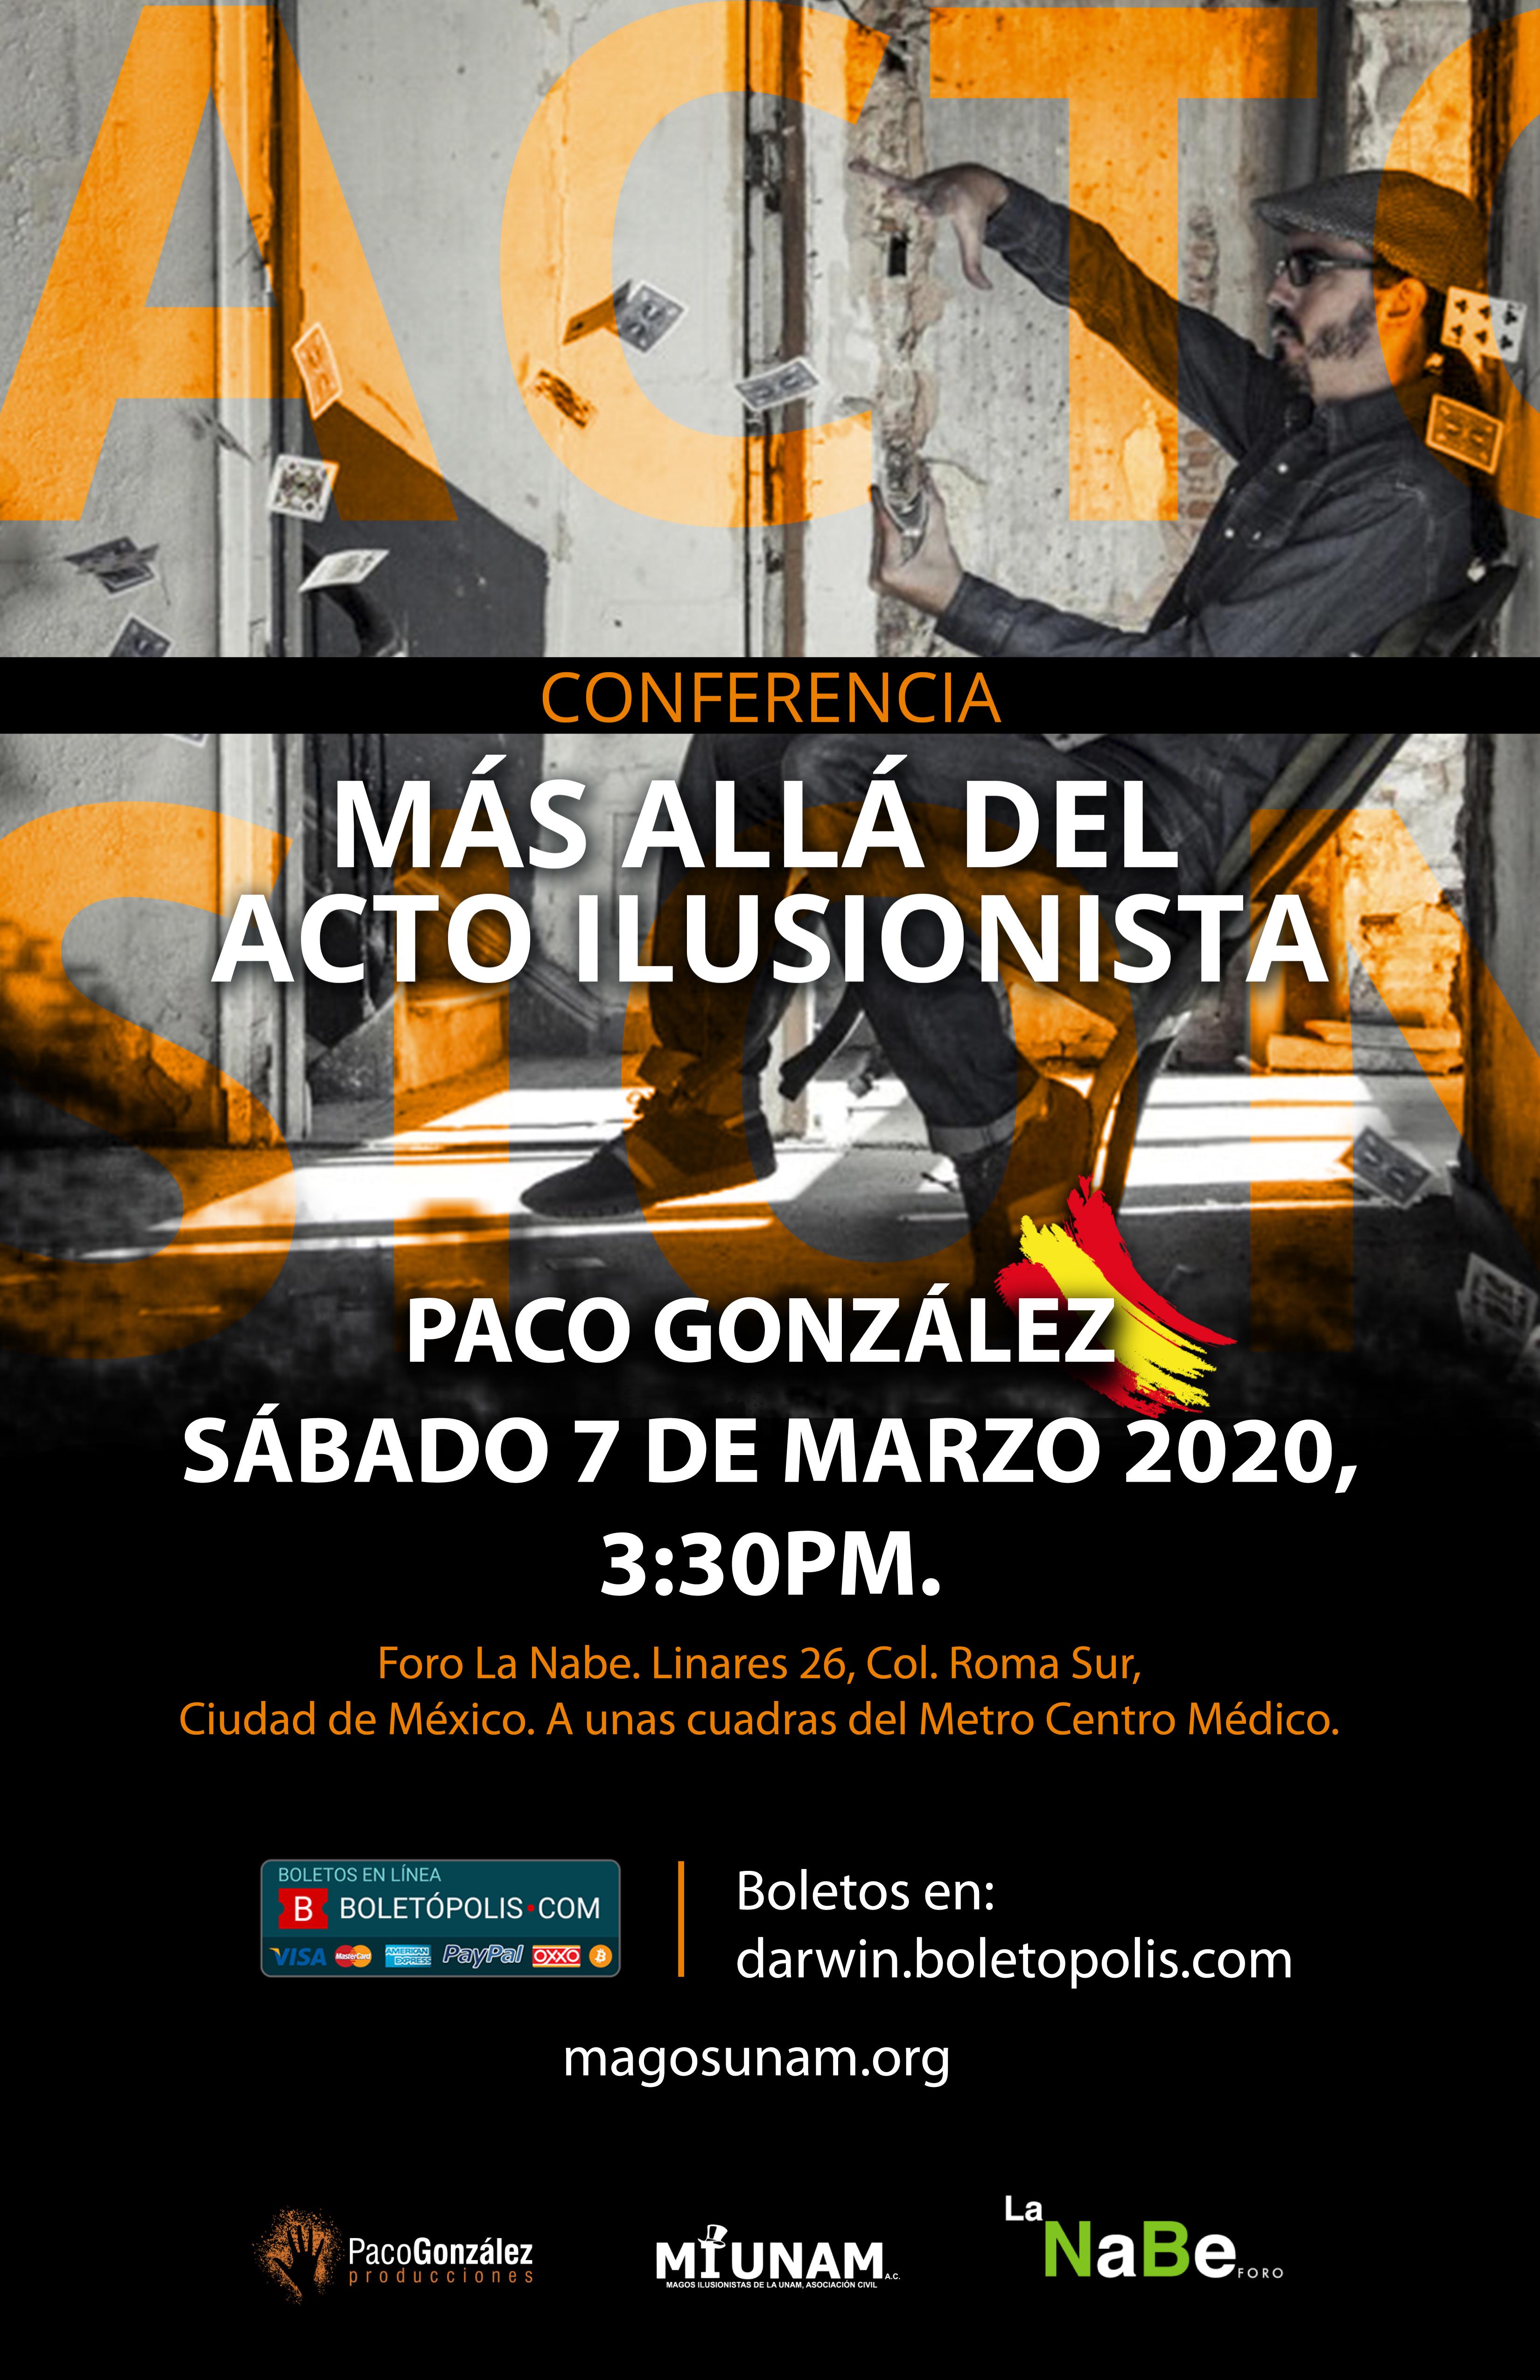 Paco González Conferencia 2020